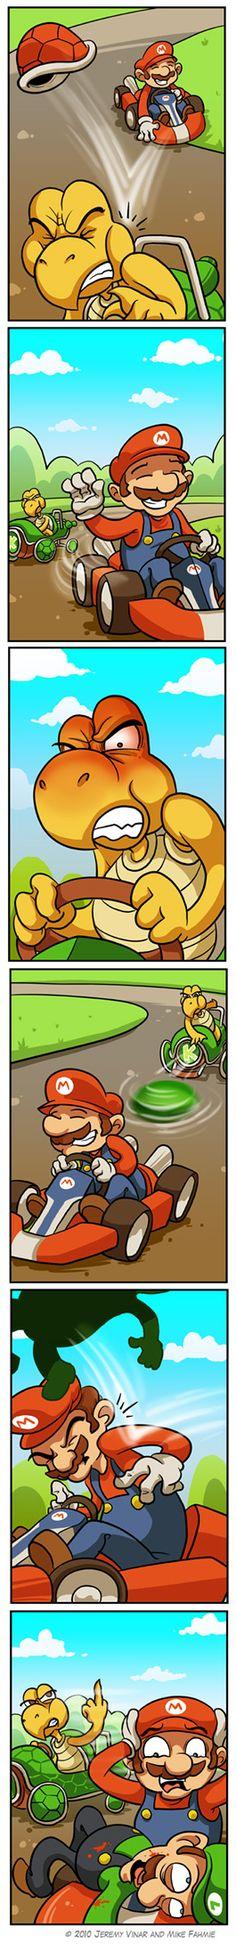 Take that motherfu***r! With Green Koopa, Luigi (corpse) and Mario.